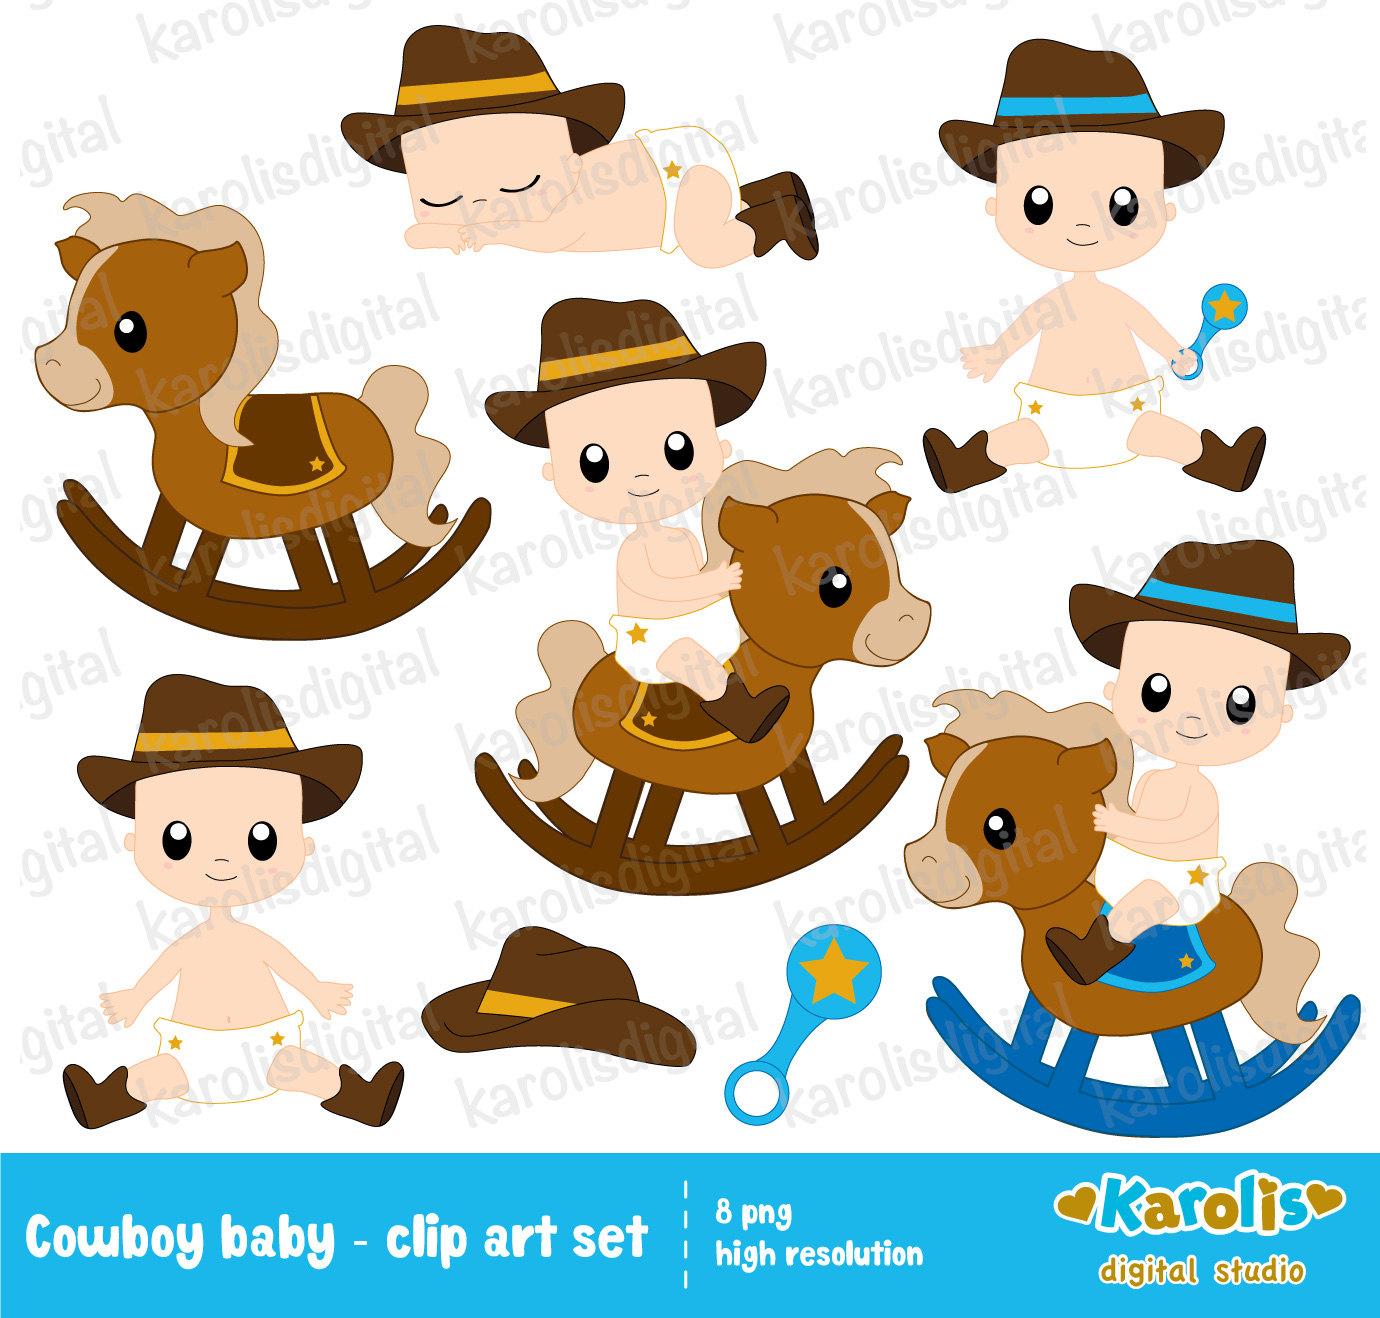 Cowboy clipart little boy Boots set  art cowboy